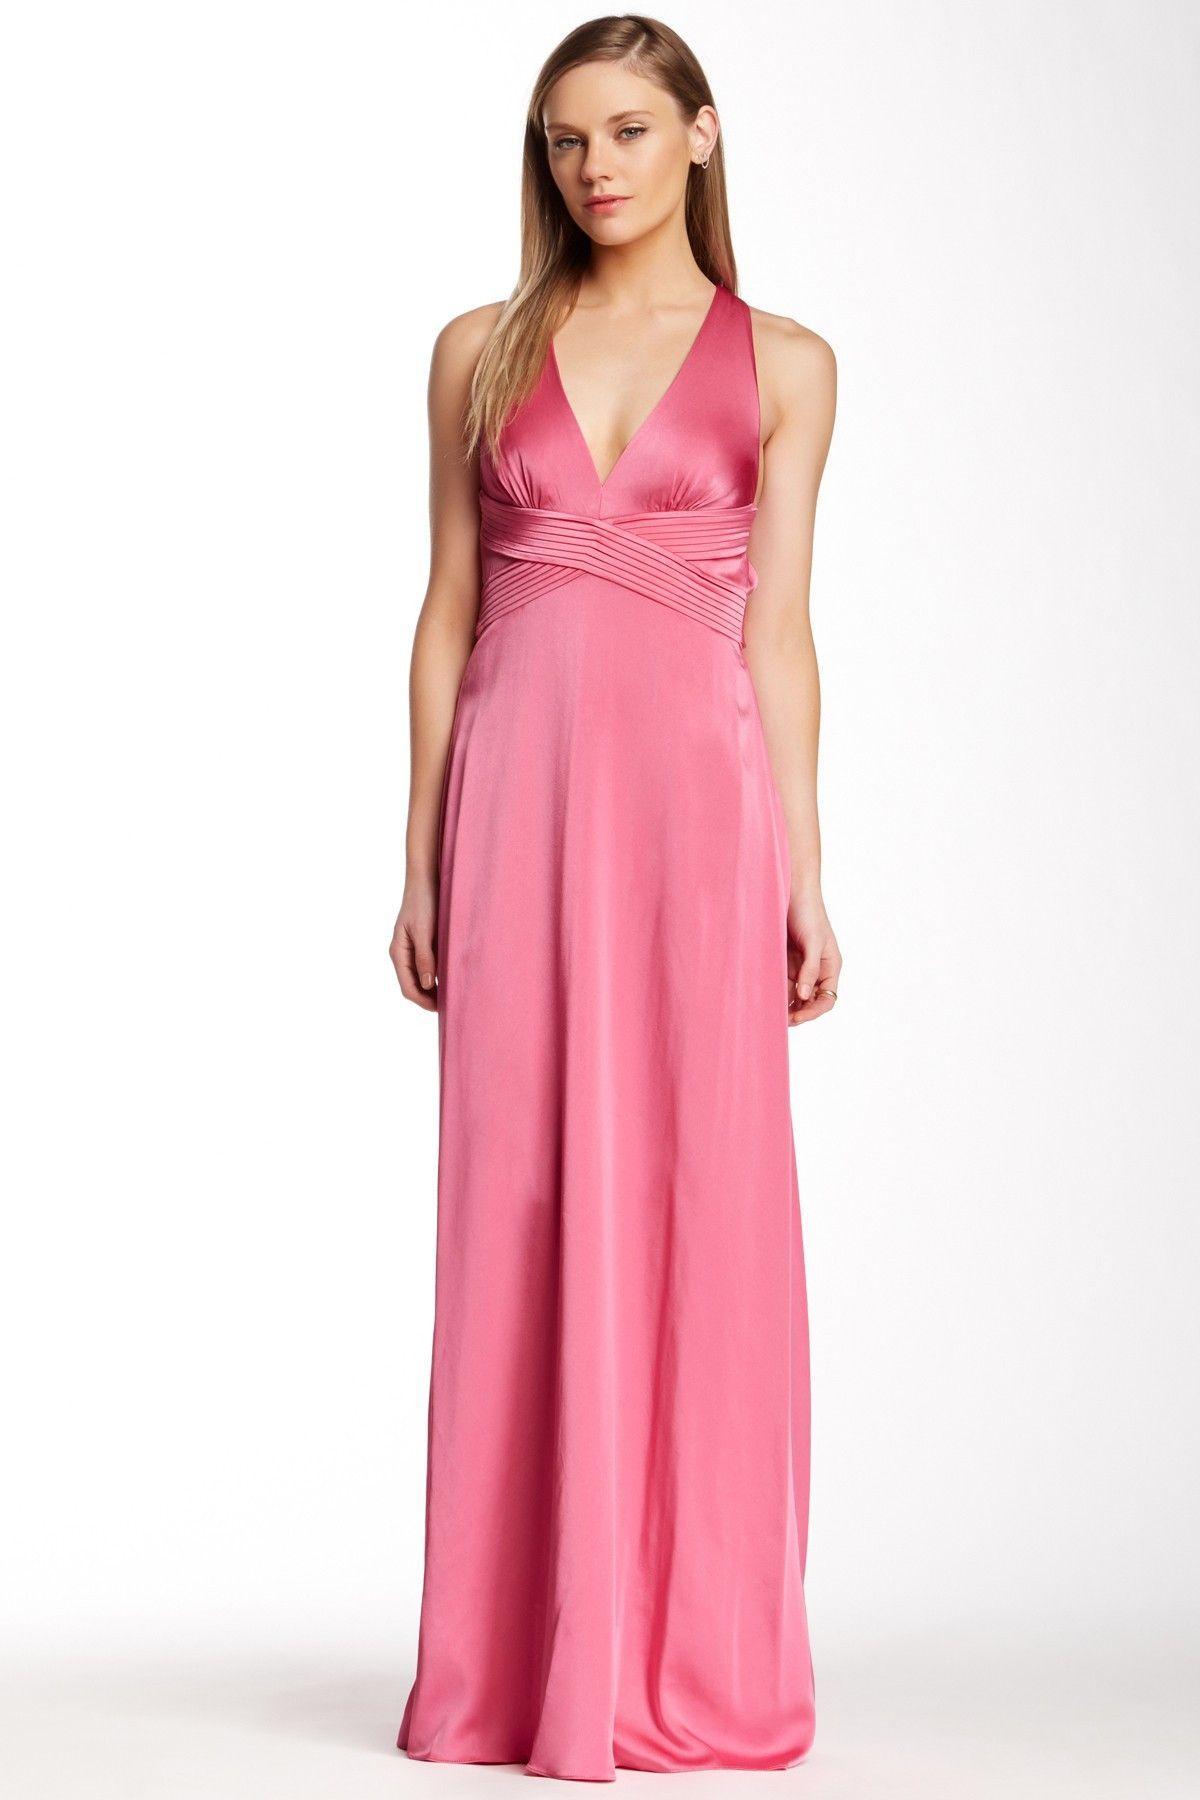 BCBG MaxAzria Crisscross Open Back Halter Style Pink Cerise Evening ...